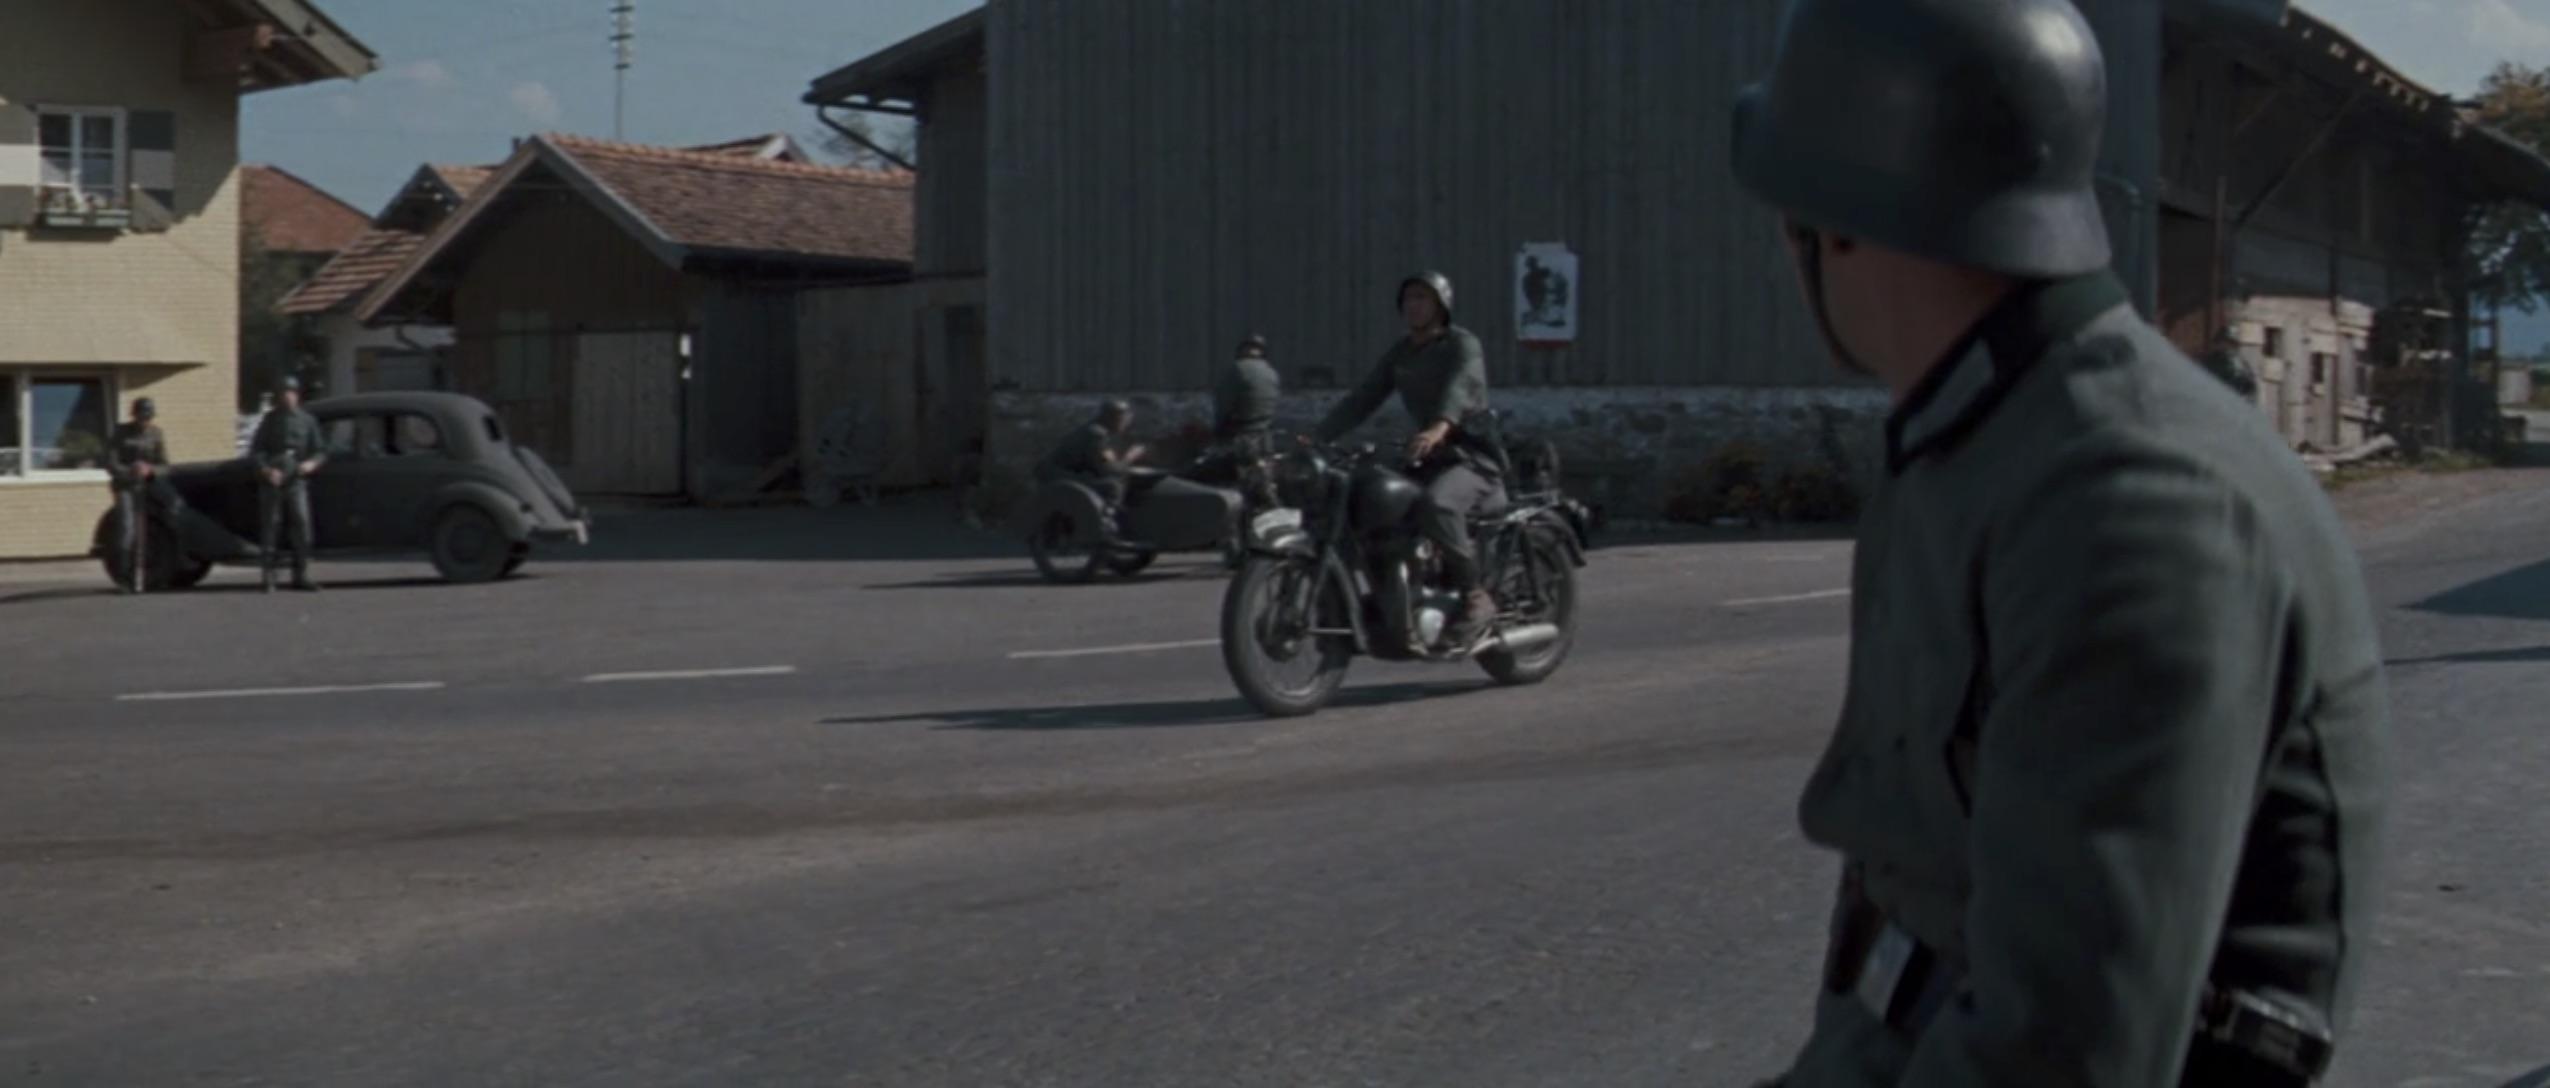 The Great Escape riding through town